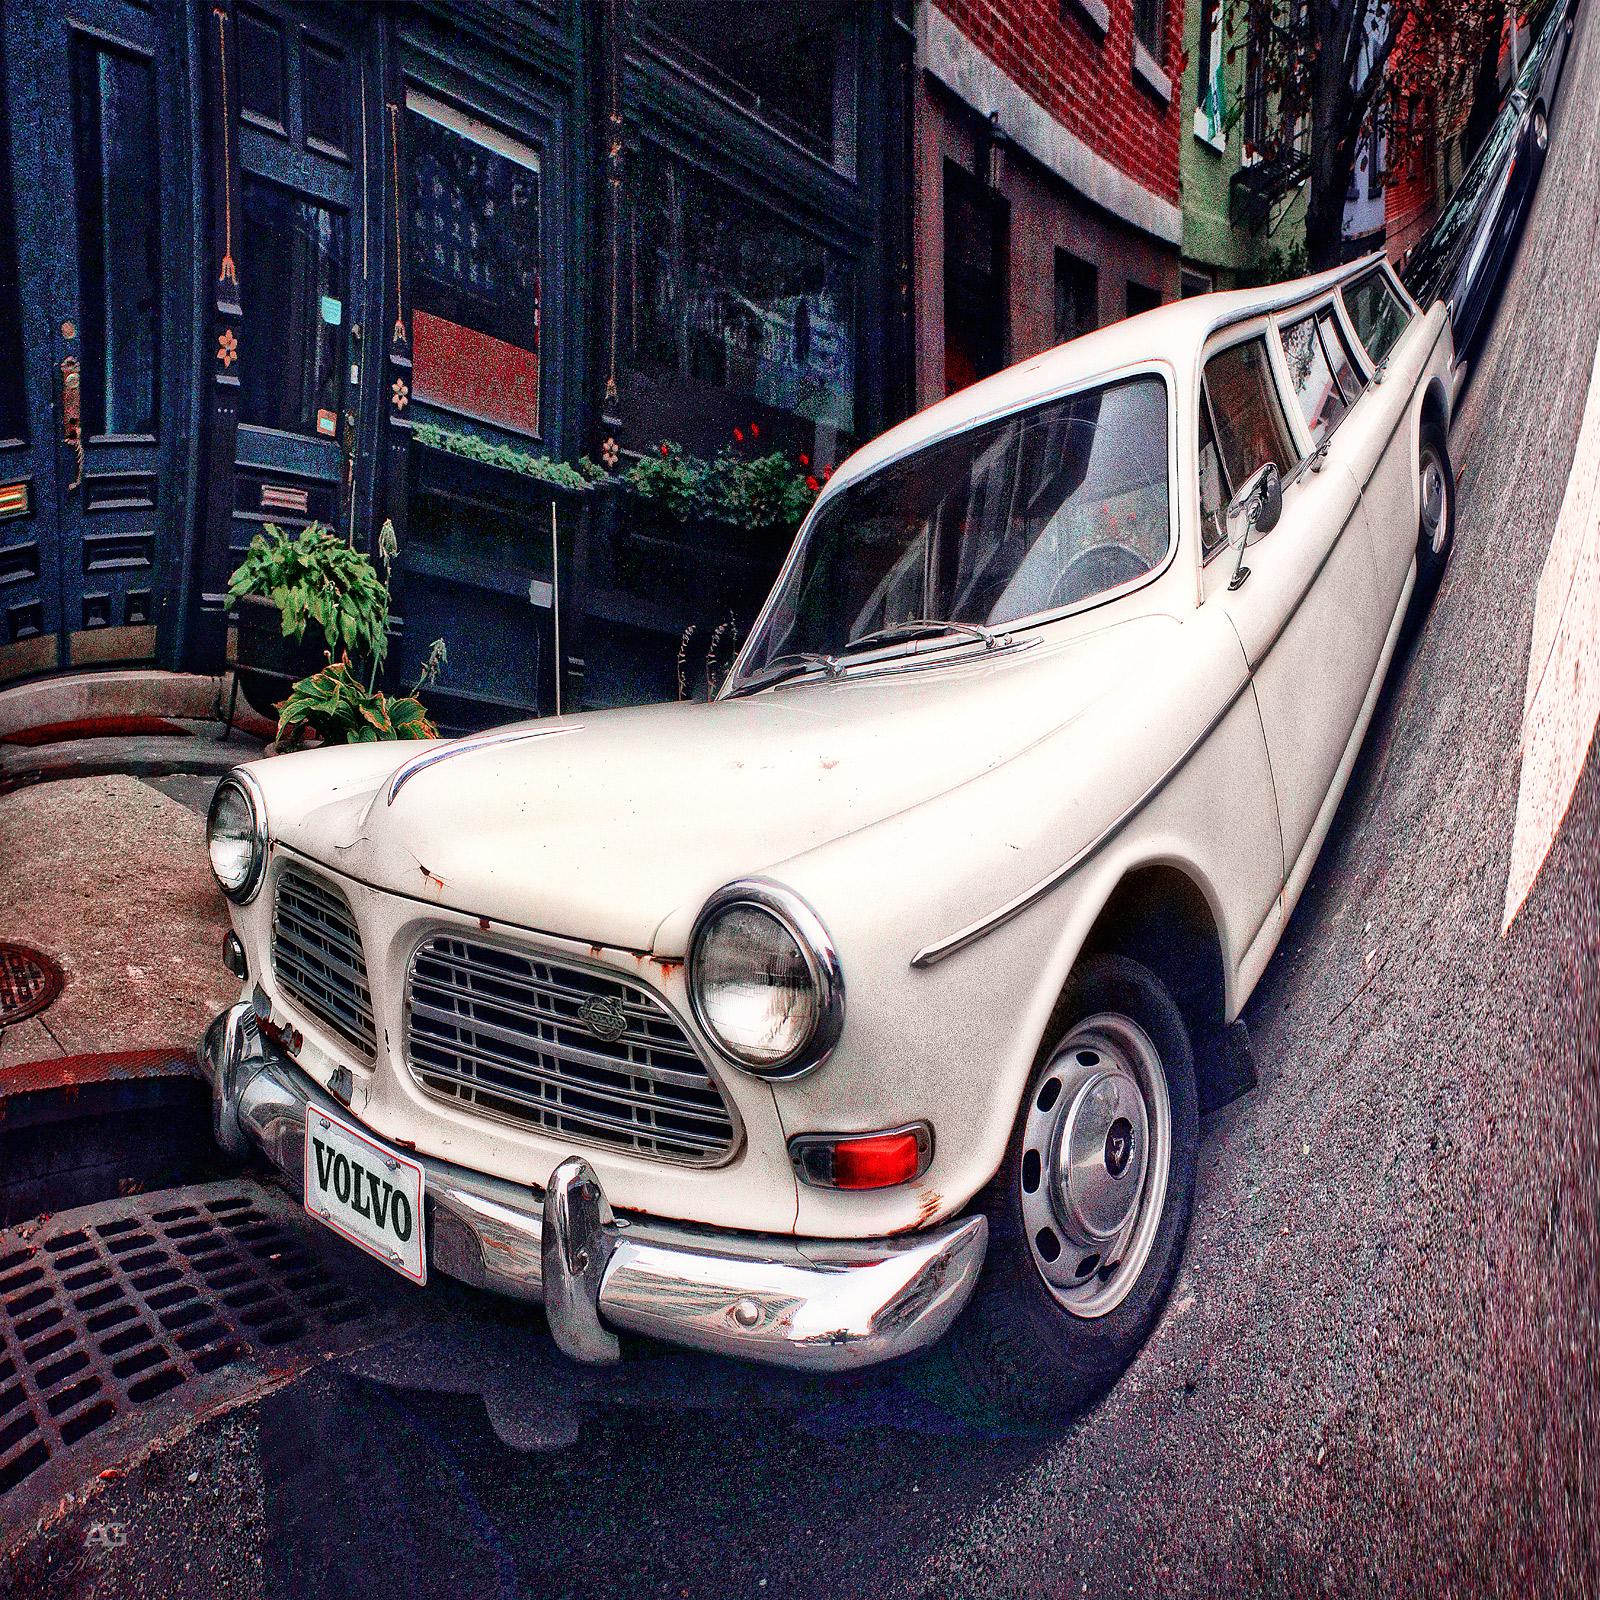 VintageWhiteVolvoInDowntownBrooklyn_warped